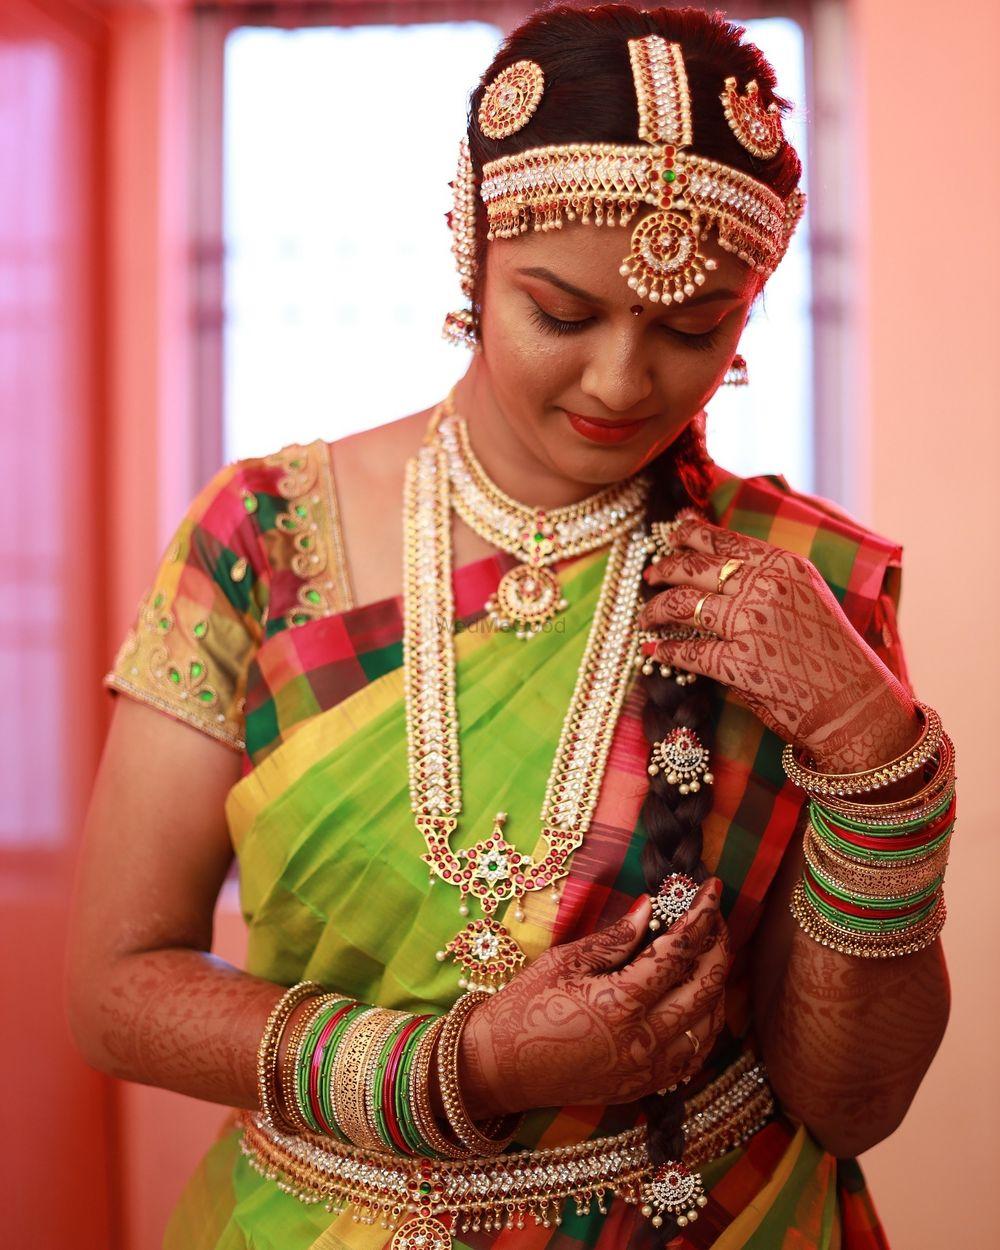 Photo By Zing Creations - Bridal Makeup